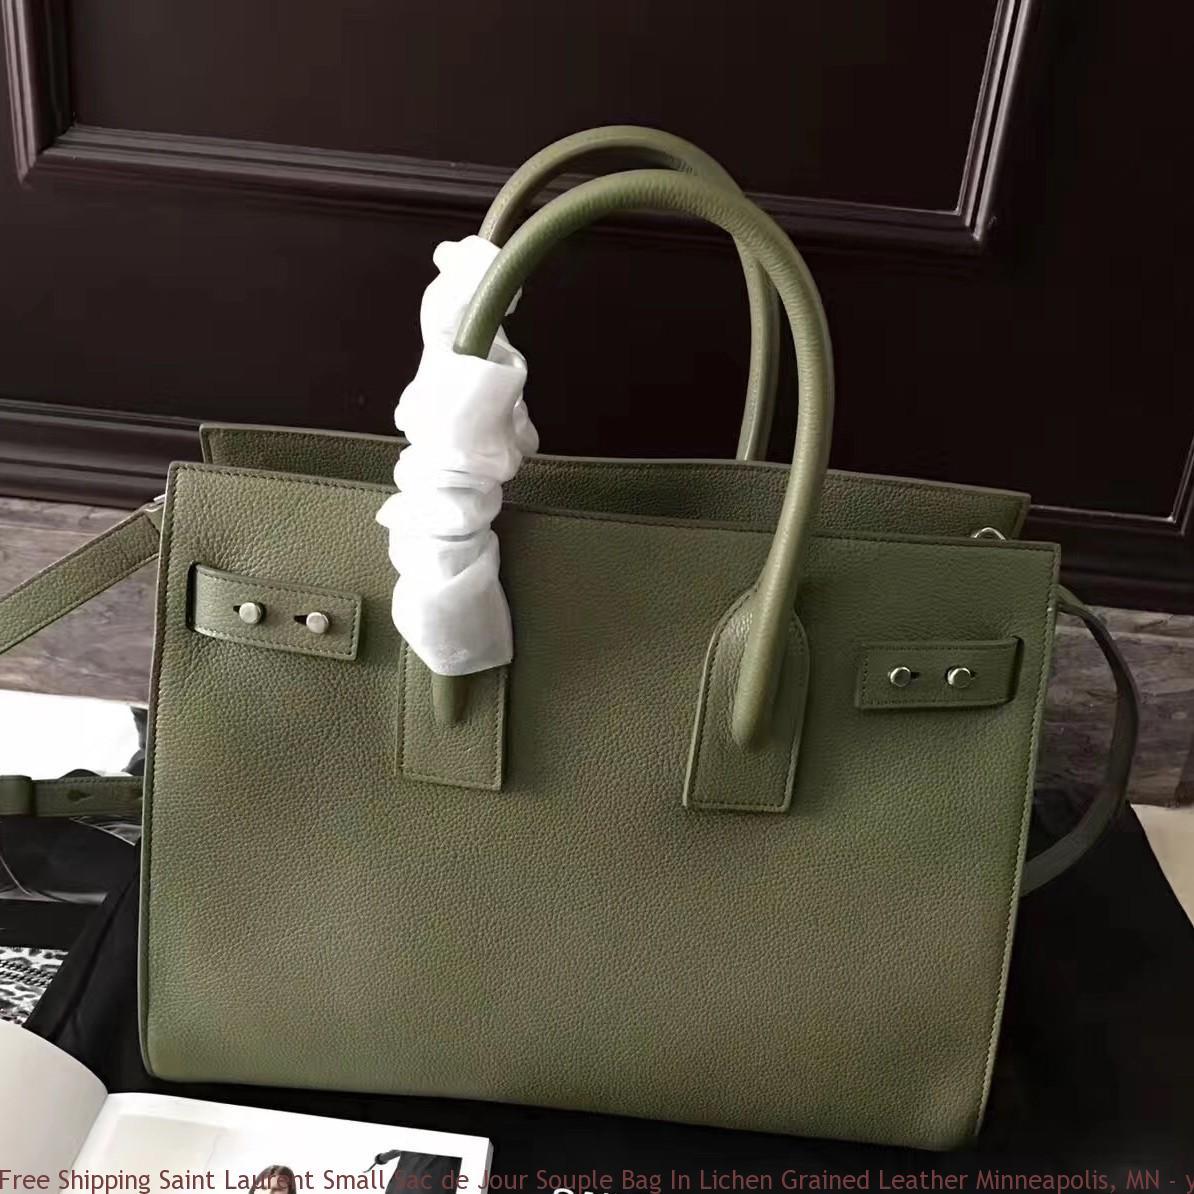 402a42c6e2b Free Shipping Saint Laurent Small Sac de Jour Souple Bag In Lichen Grained  Leather ...